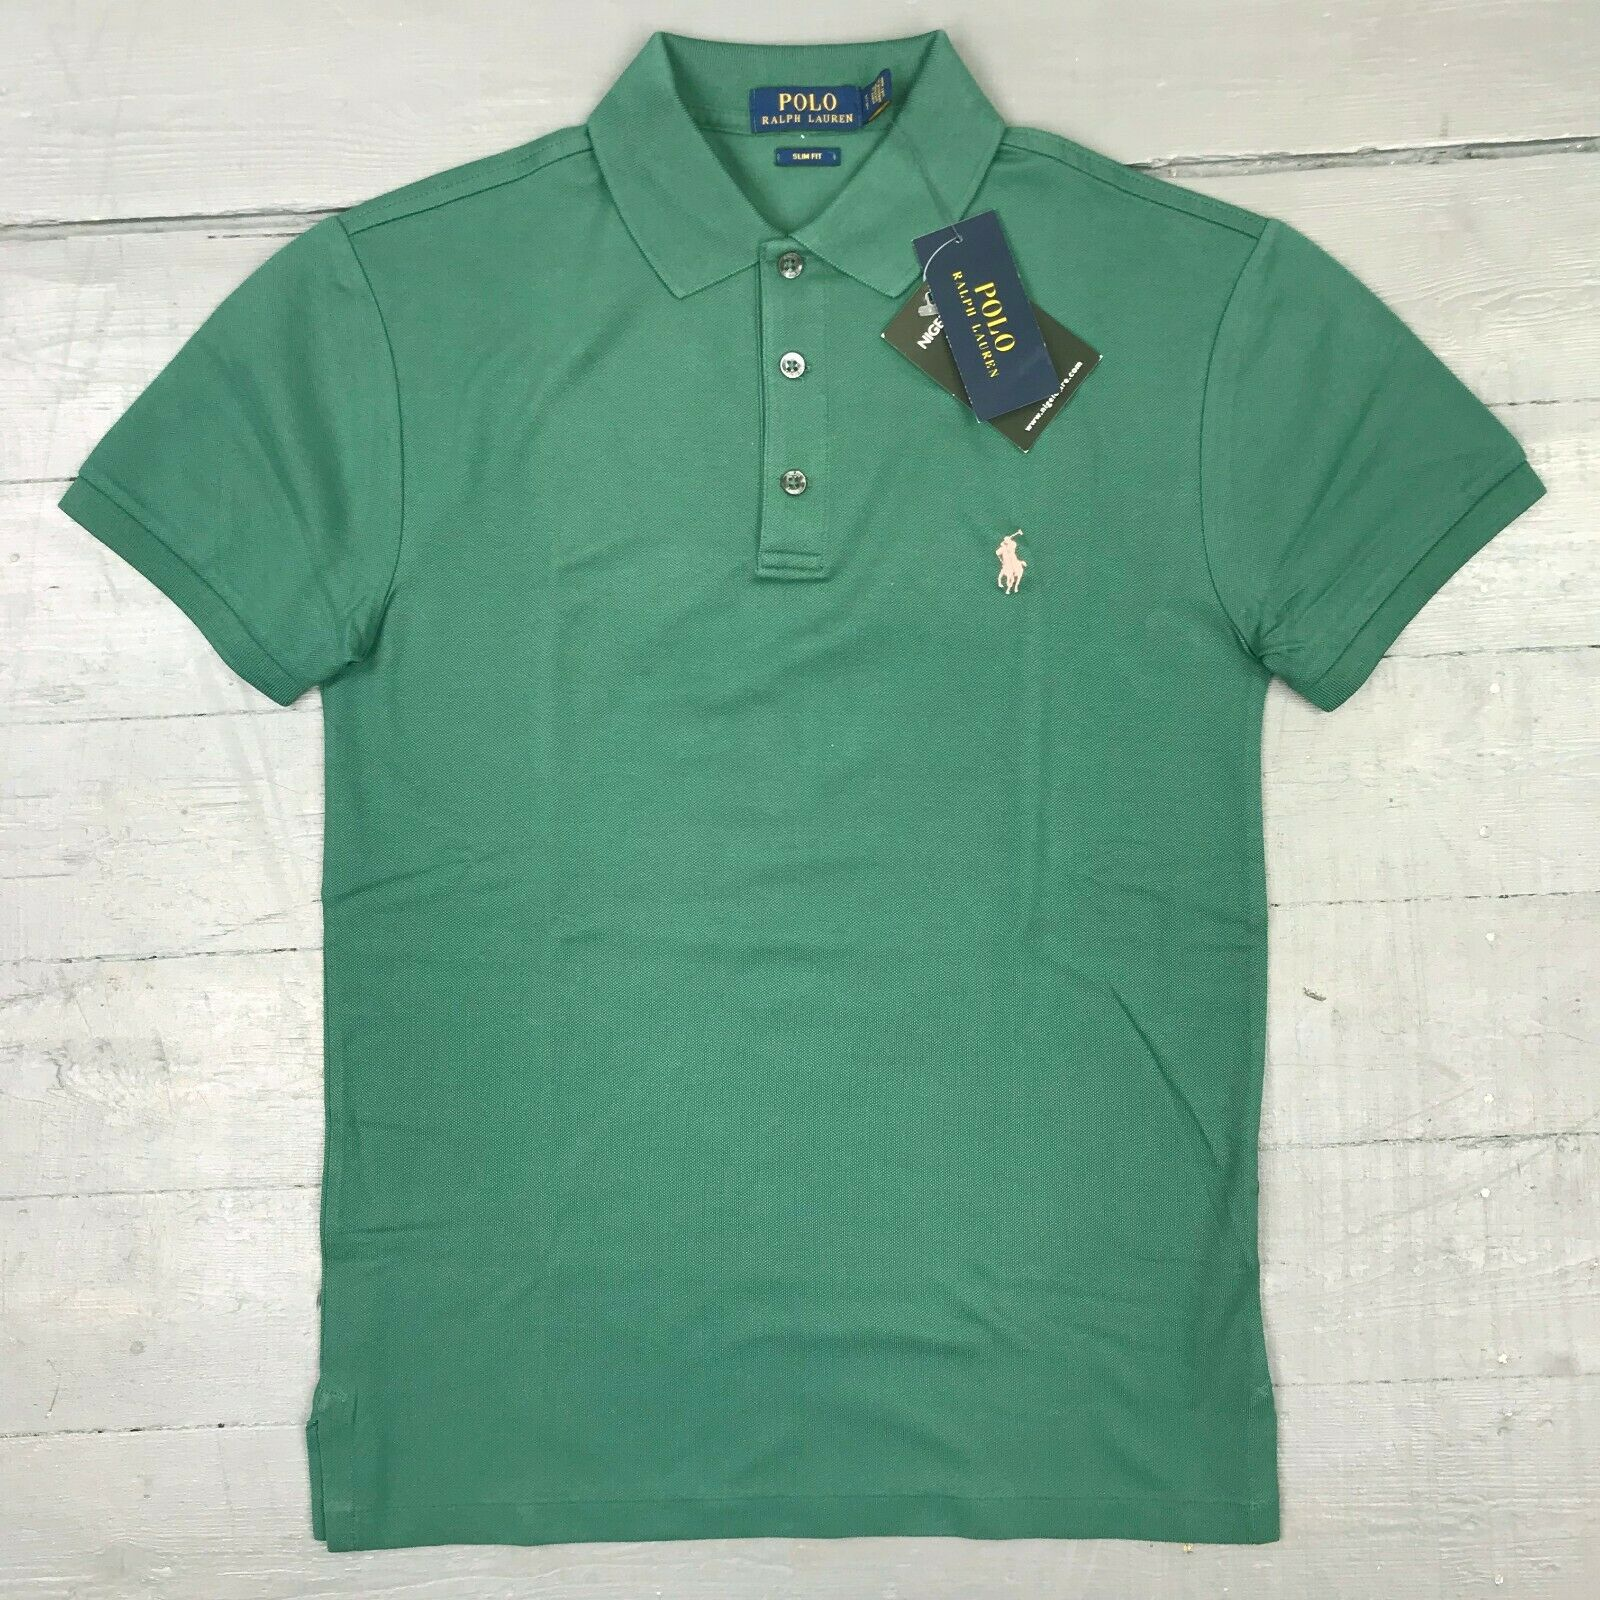 Ralph Lauren - Slim Fit Mesh Polo Shirt in Green - Size XXL - RRP